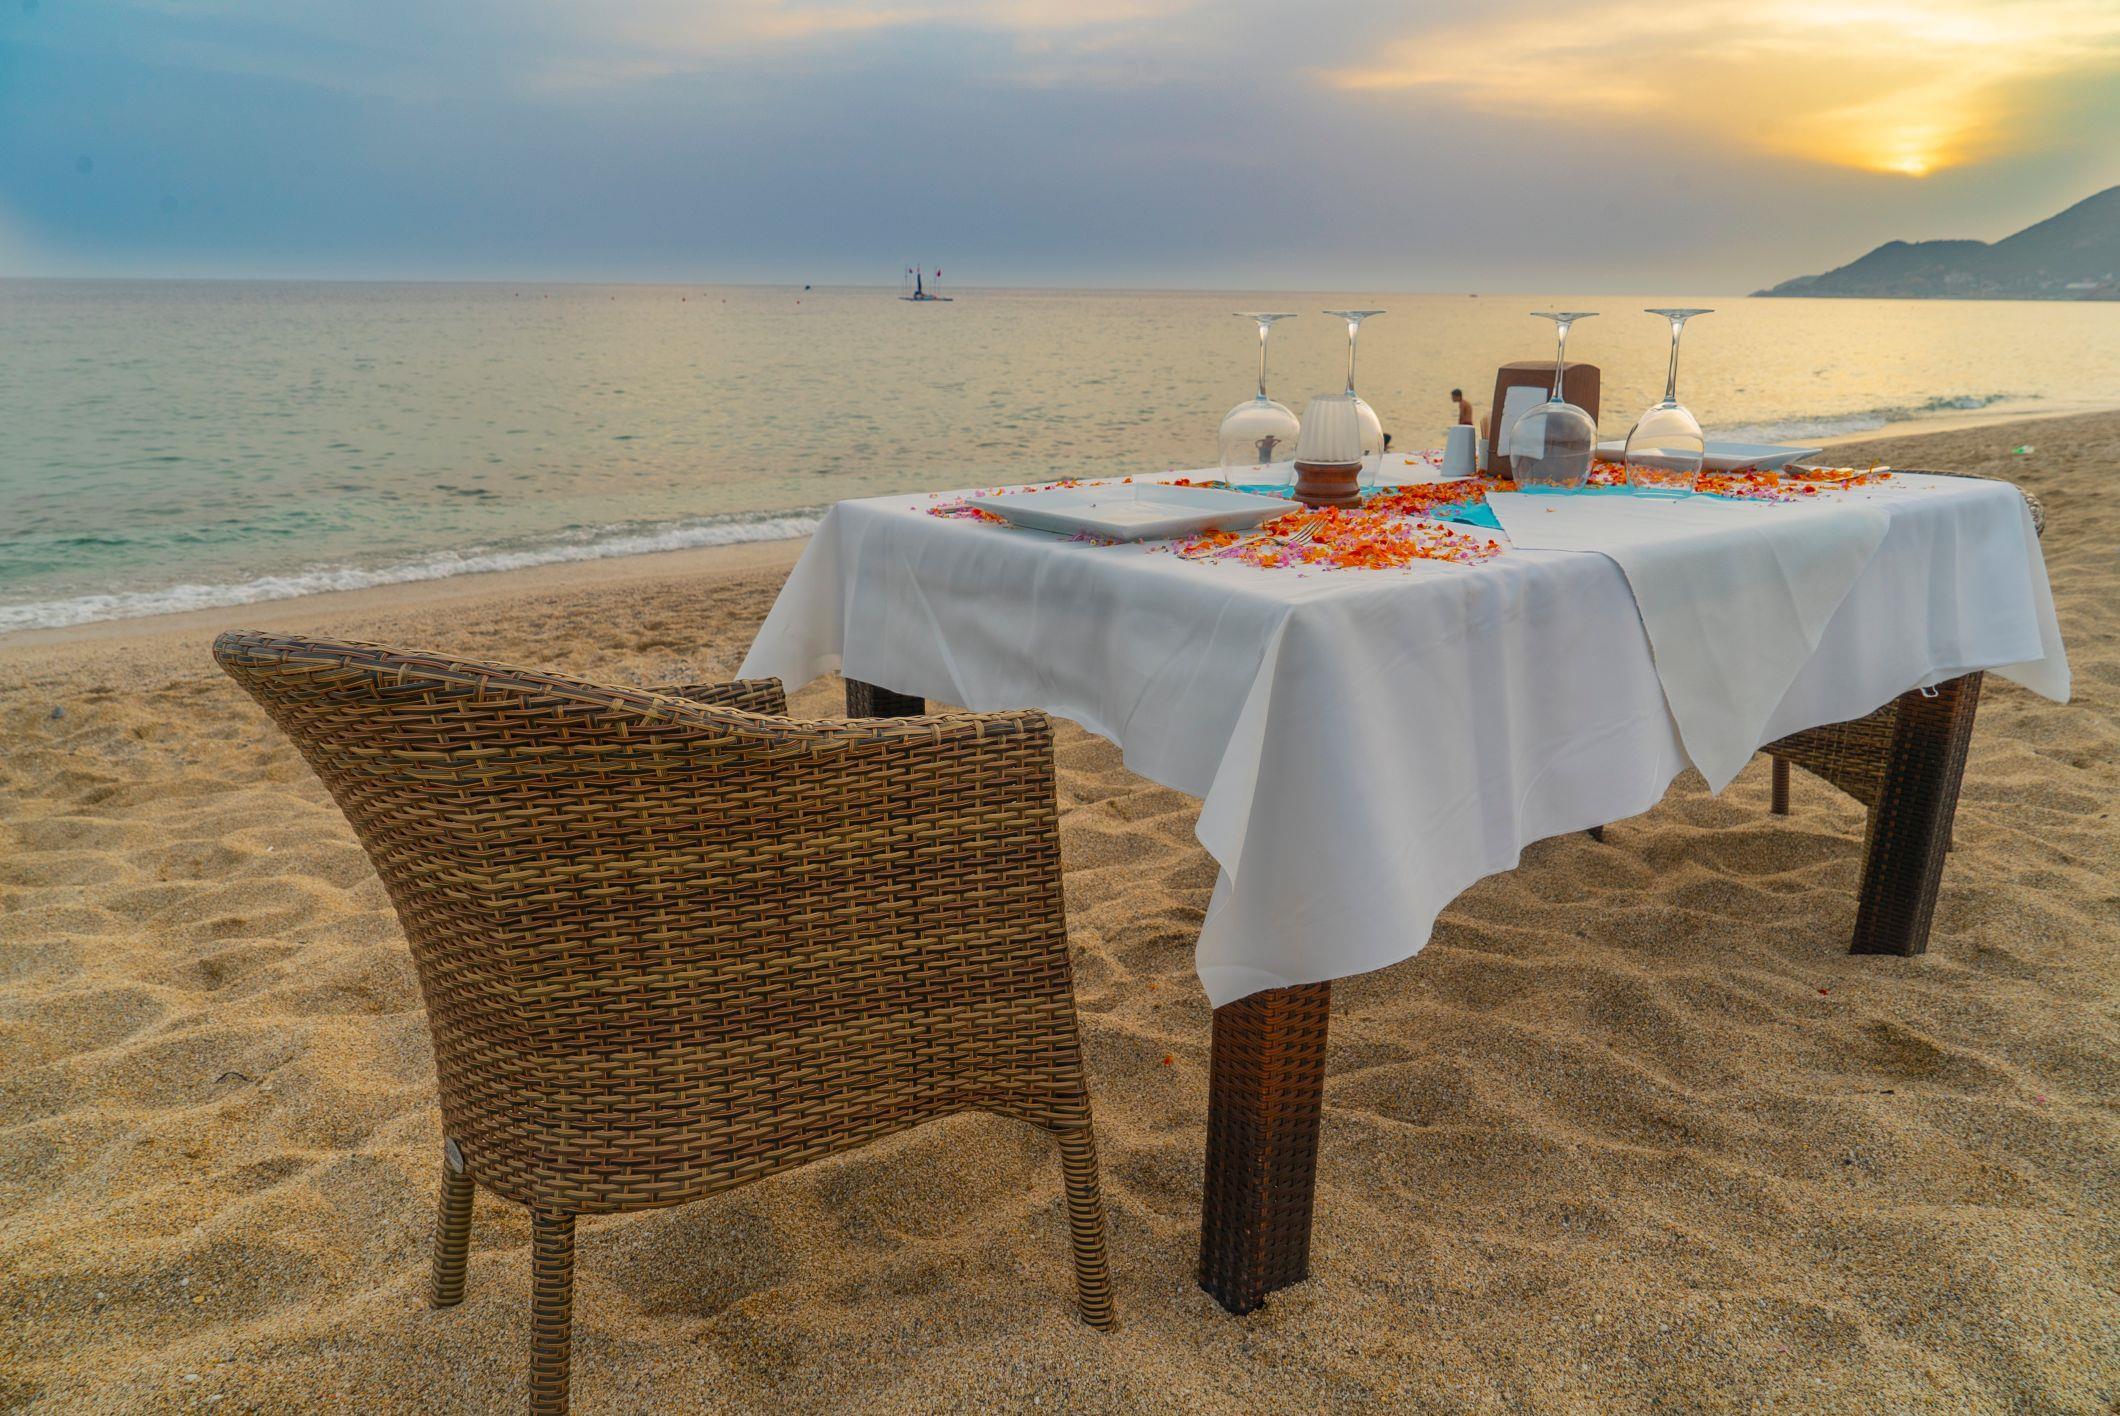 http://www.orextravel.sk/OREX/hotelphotos/azak-beach-general-0018.jpg